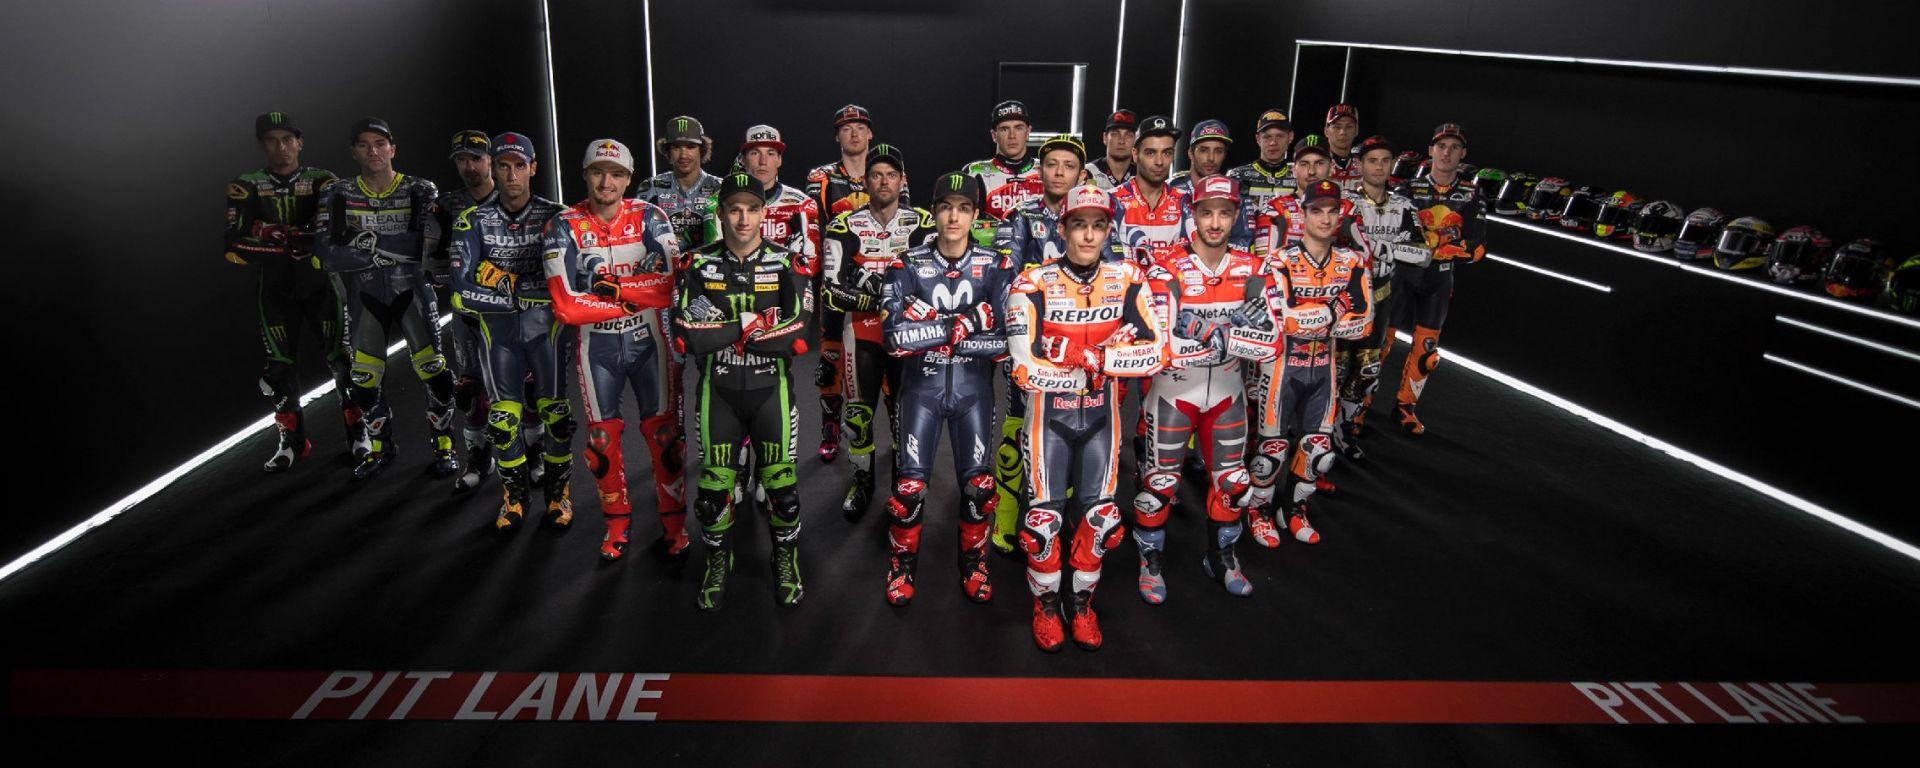 Team e piloti Motogp 2018: la lista completa